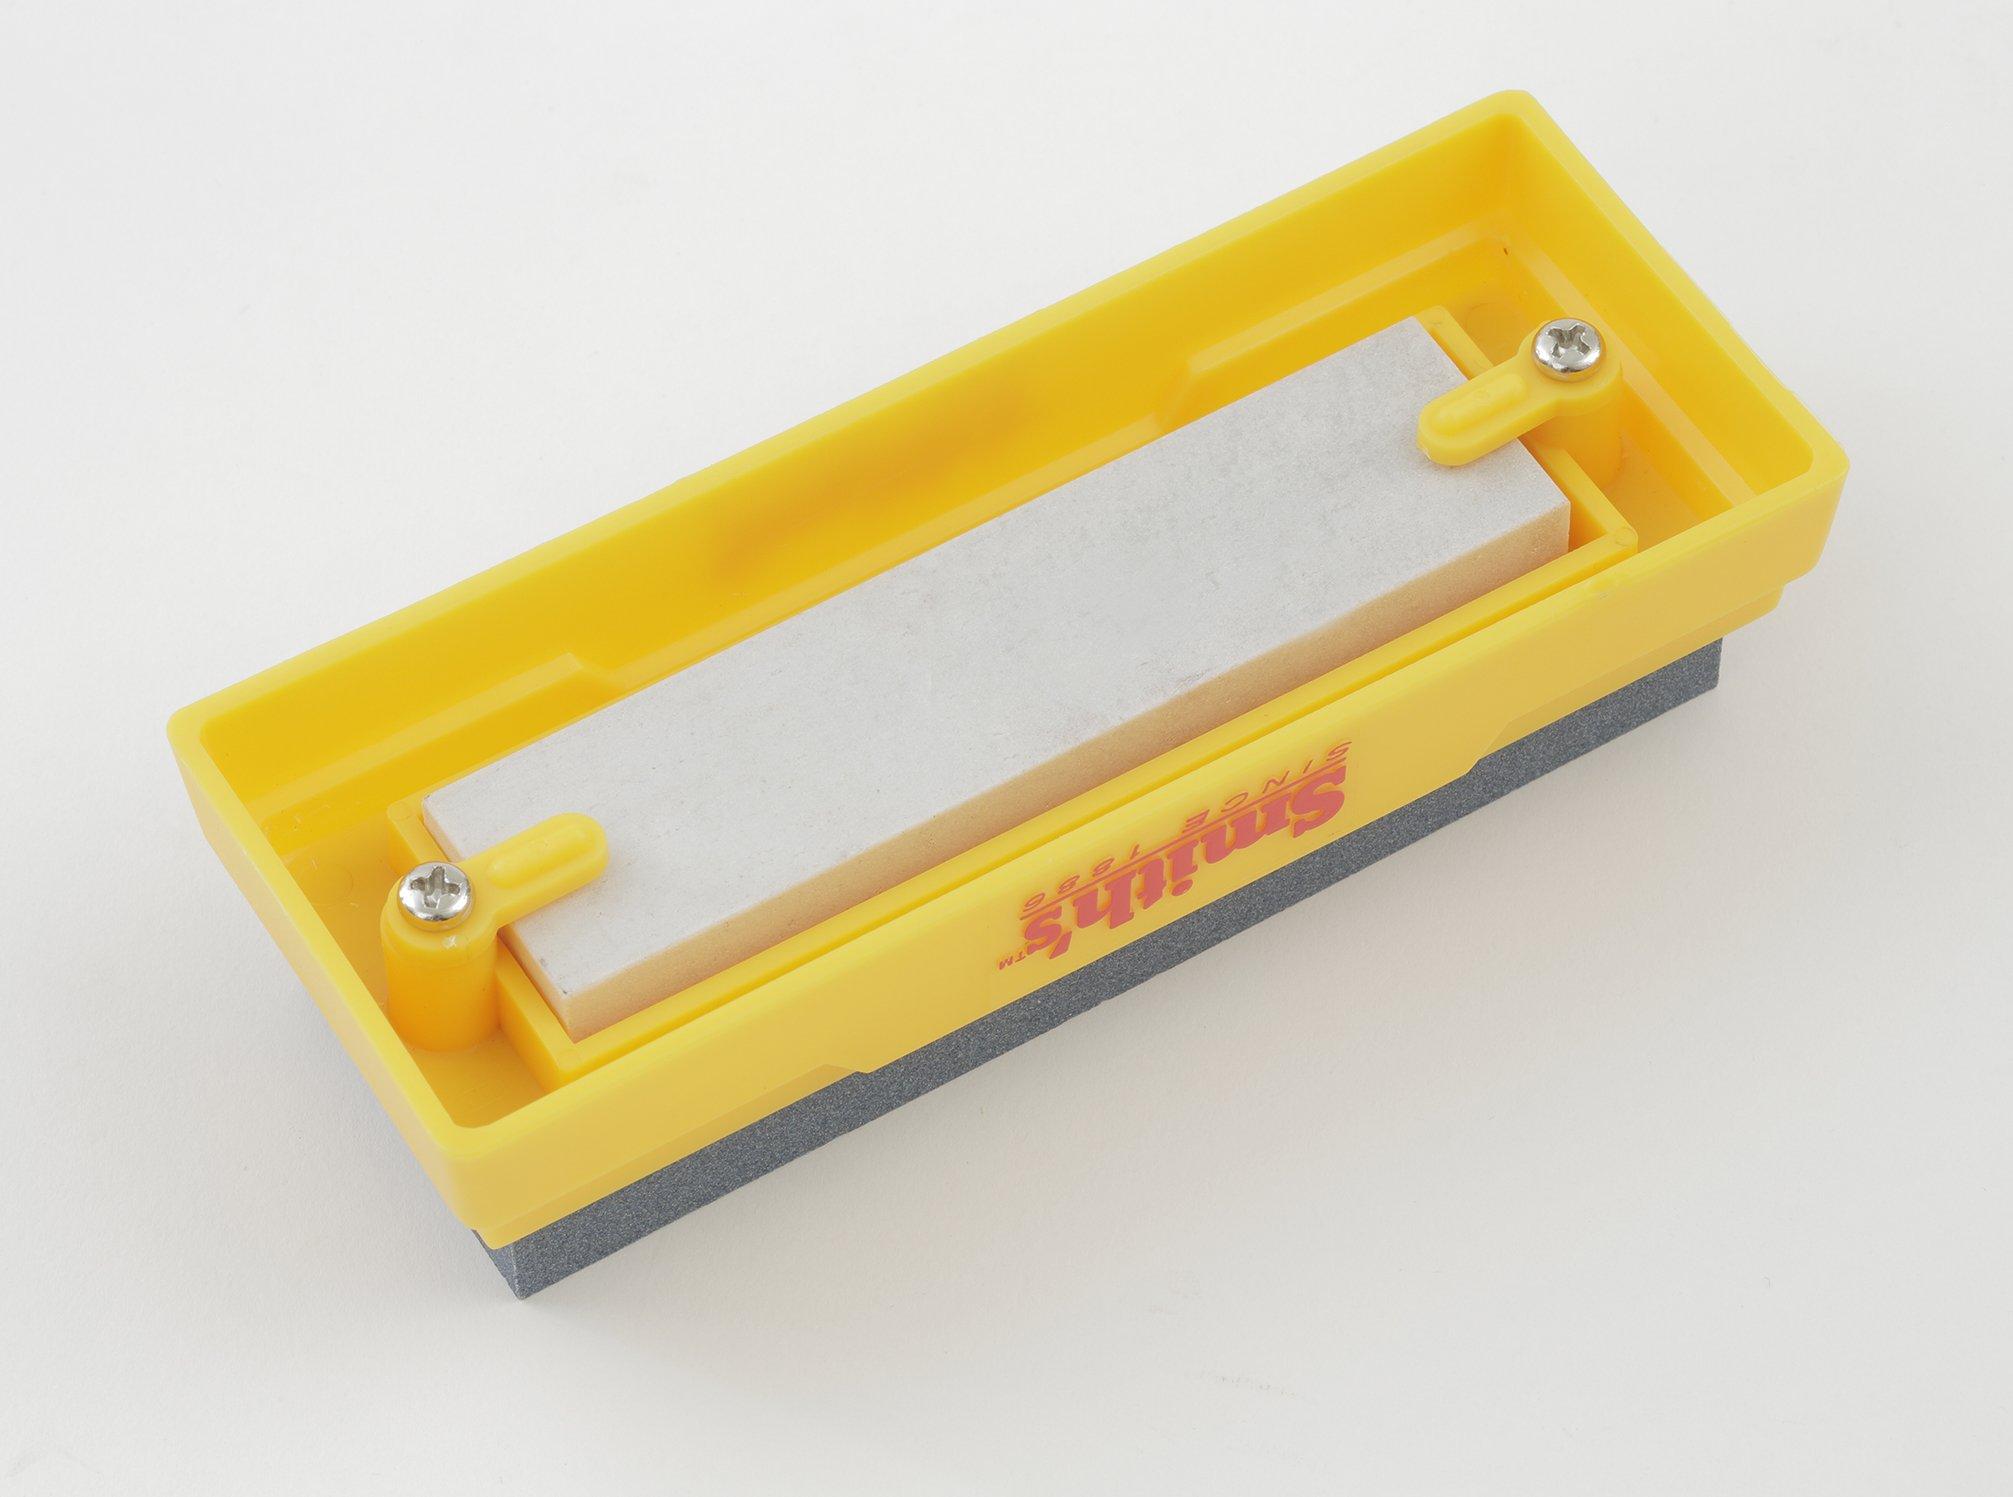 Smith's SK2 2-Stone Sharpening Kit